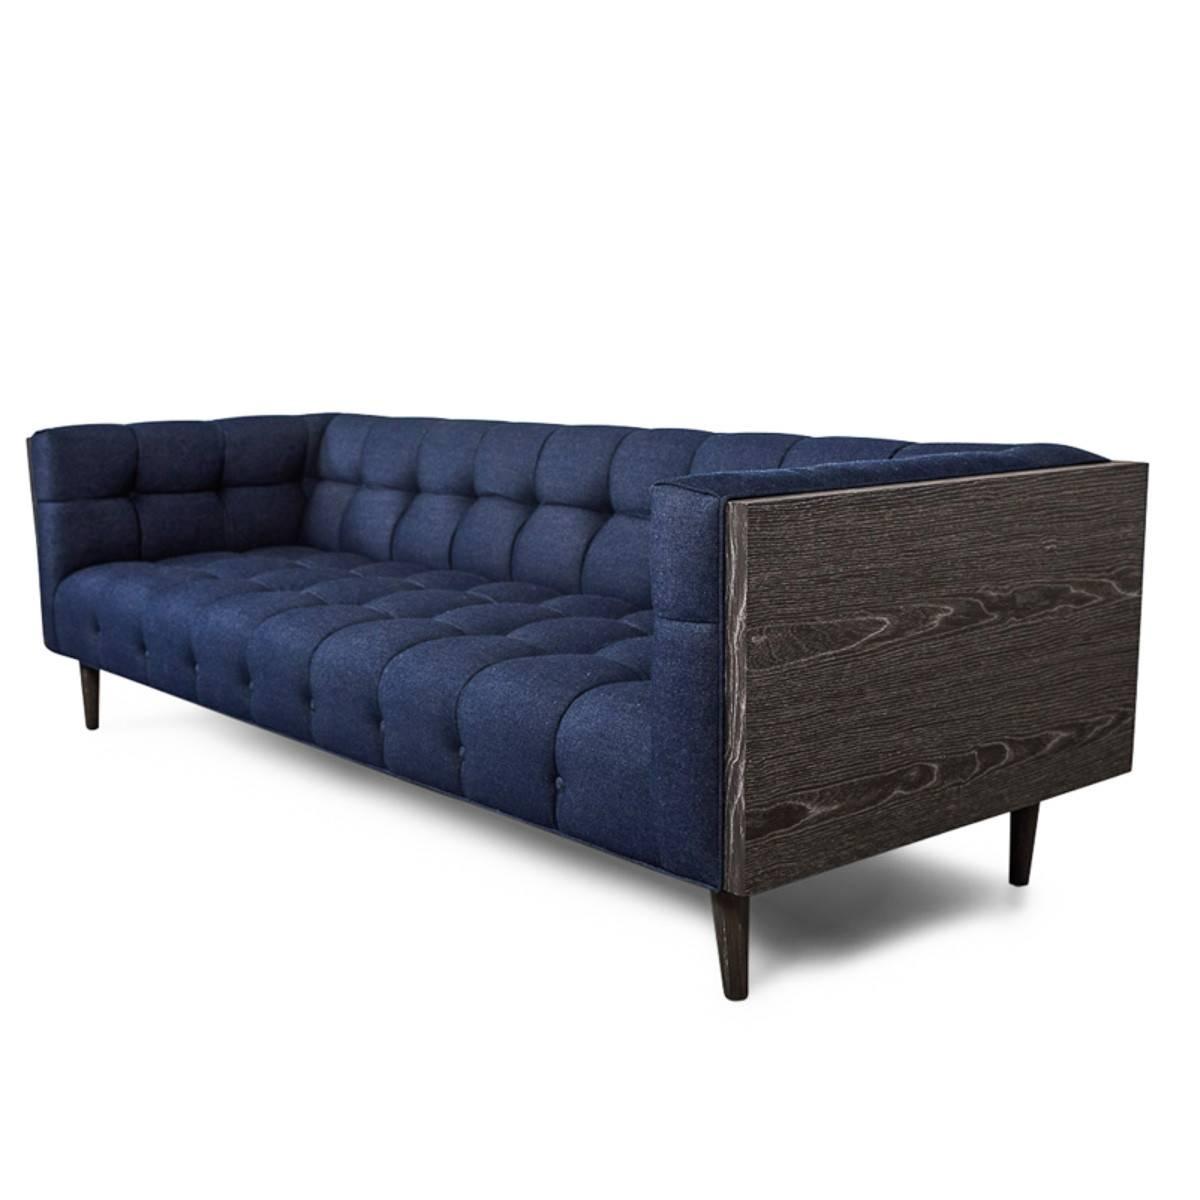 Sofas: Mid Century Settee | Mid Century Sofas | Cheap Mid Century in Cheap Retro Sofas (Image 15 of 30)